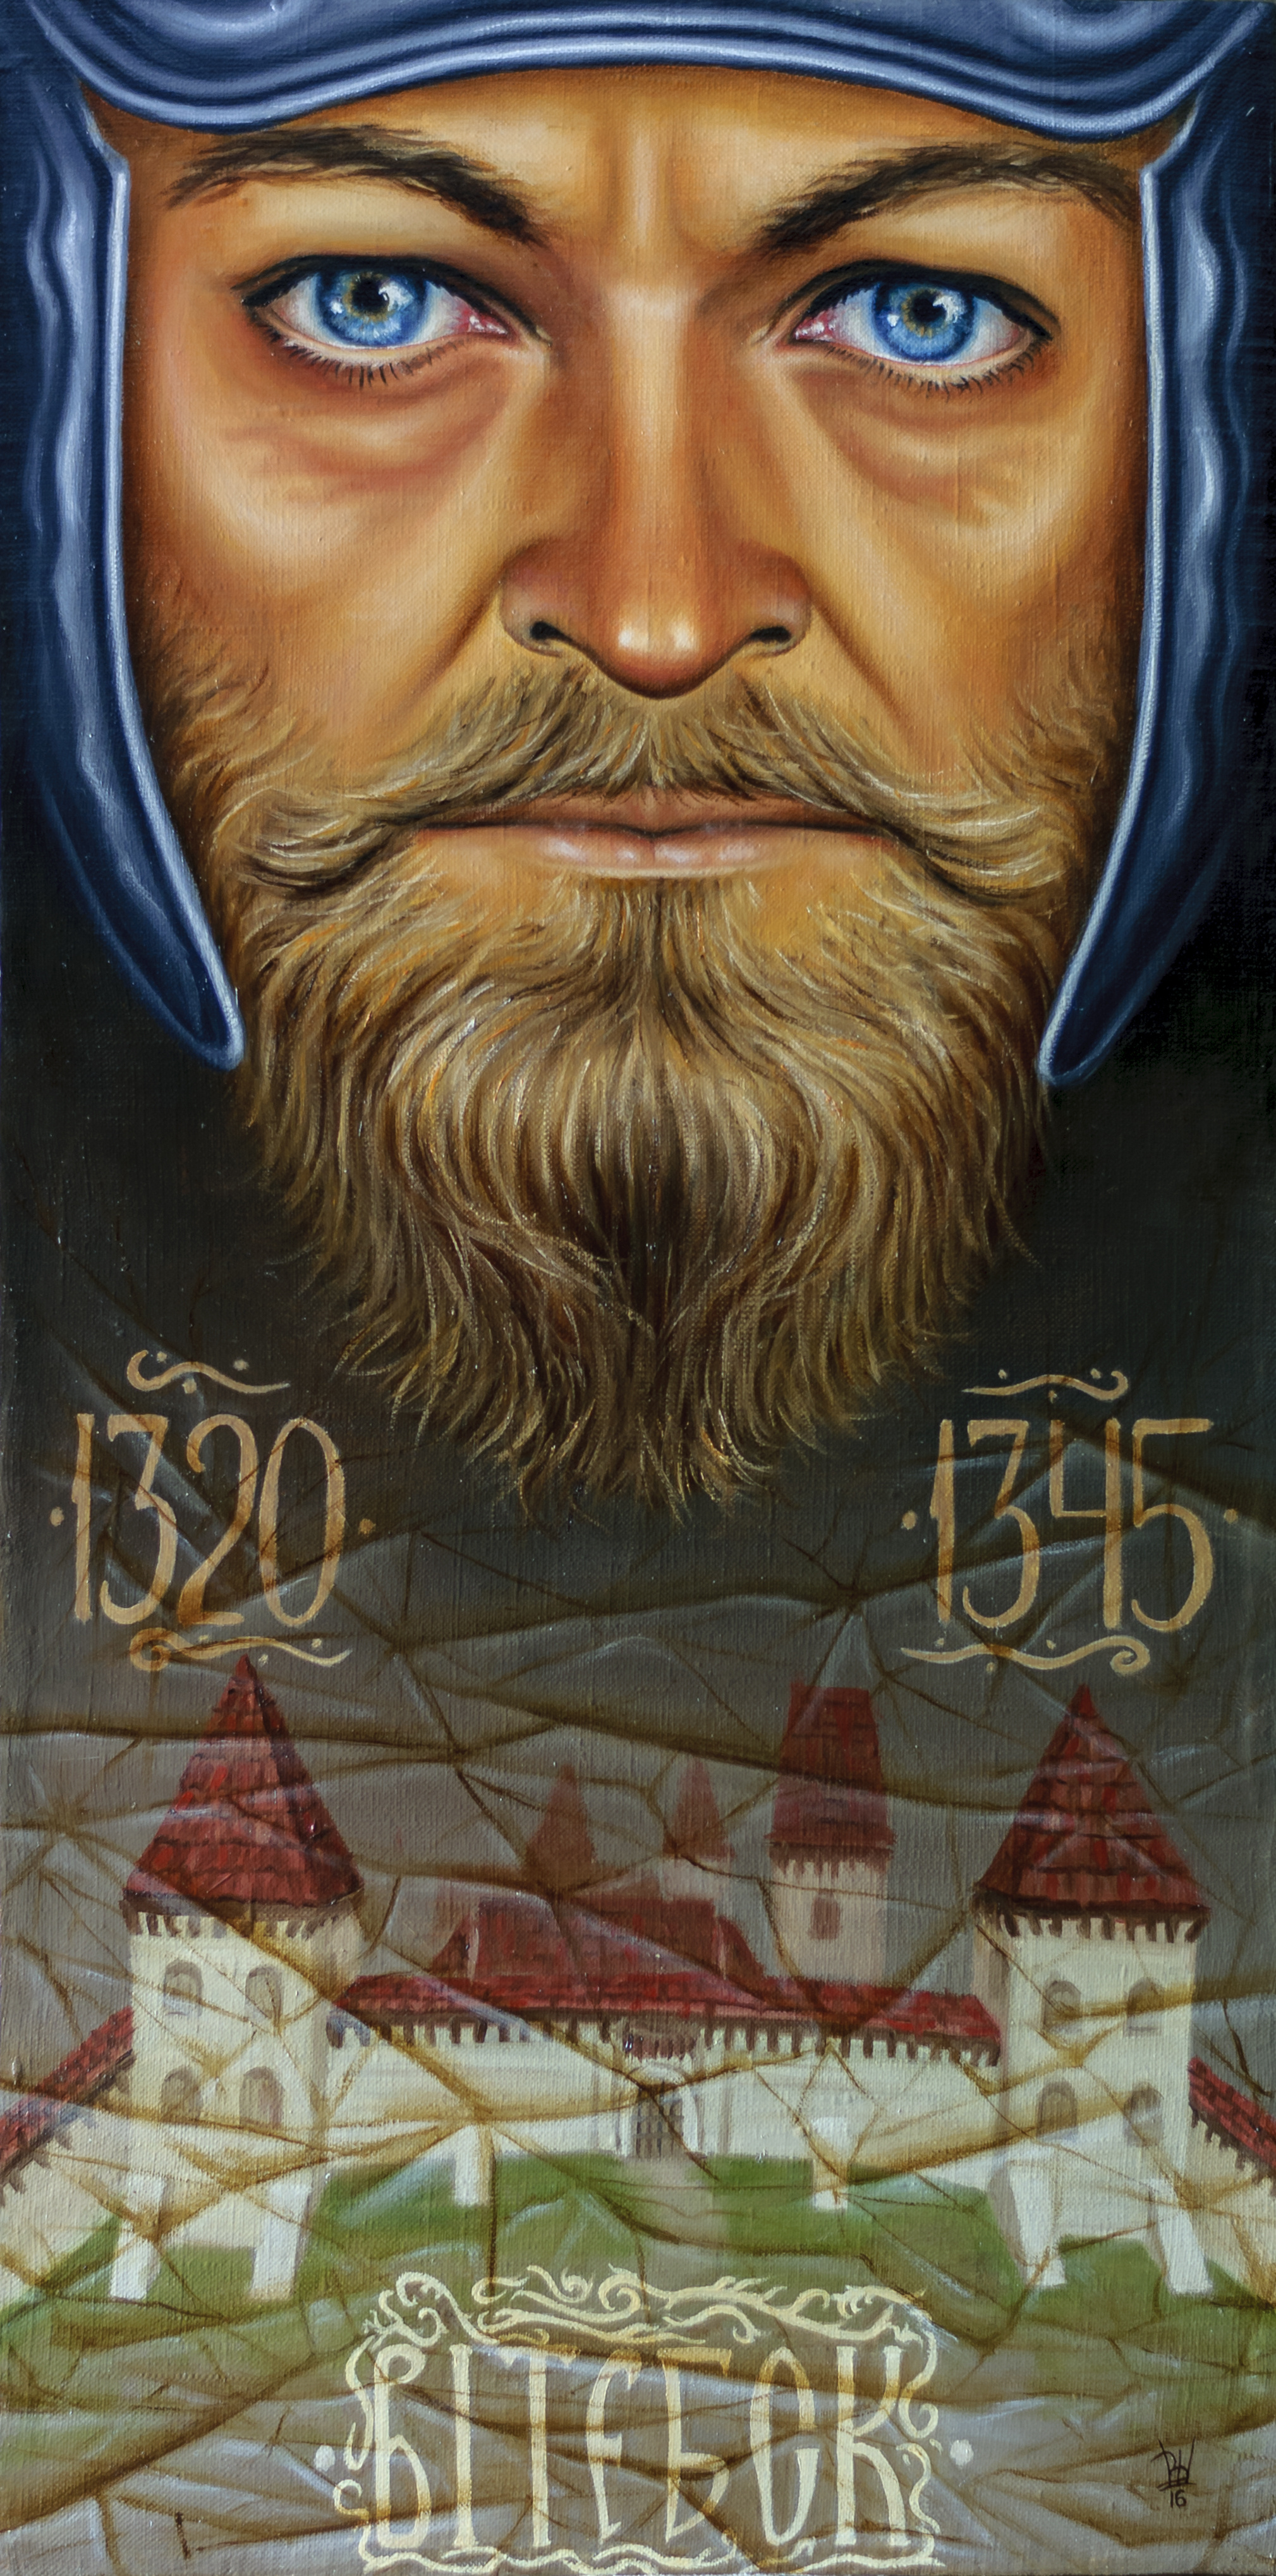 Вячеслав Юрьевич Шайнуров. Prince Olgerd